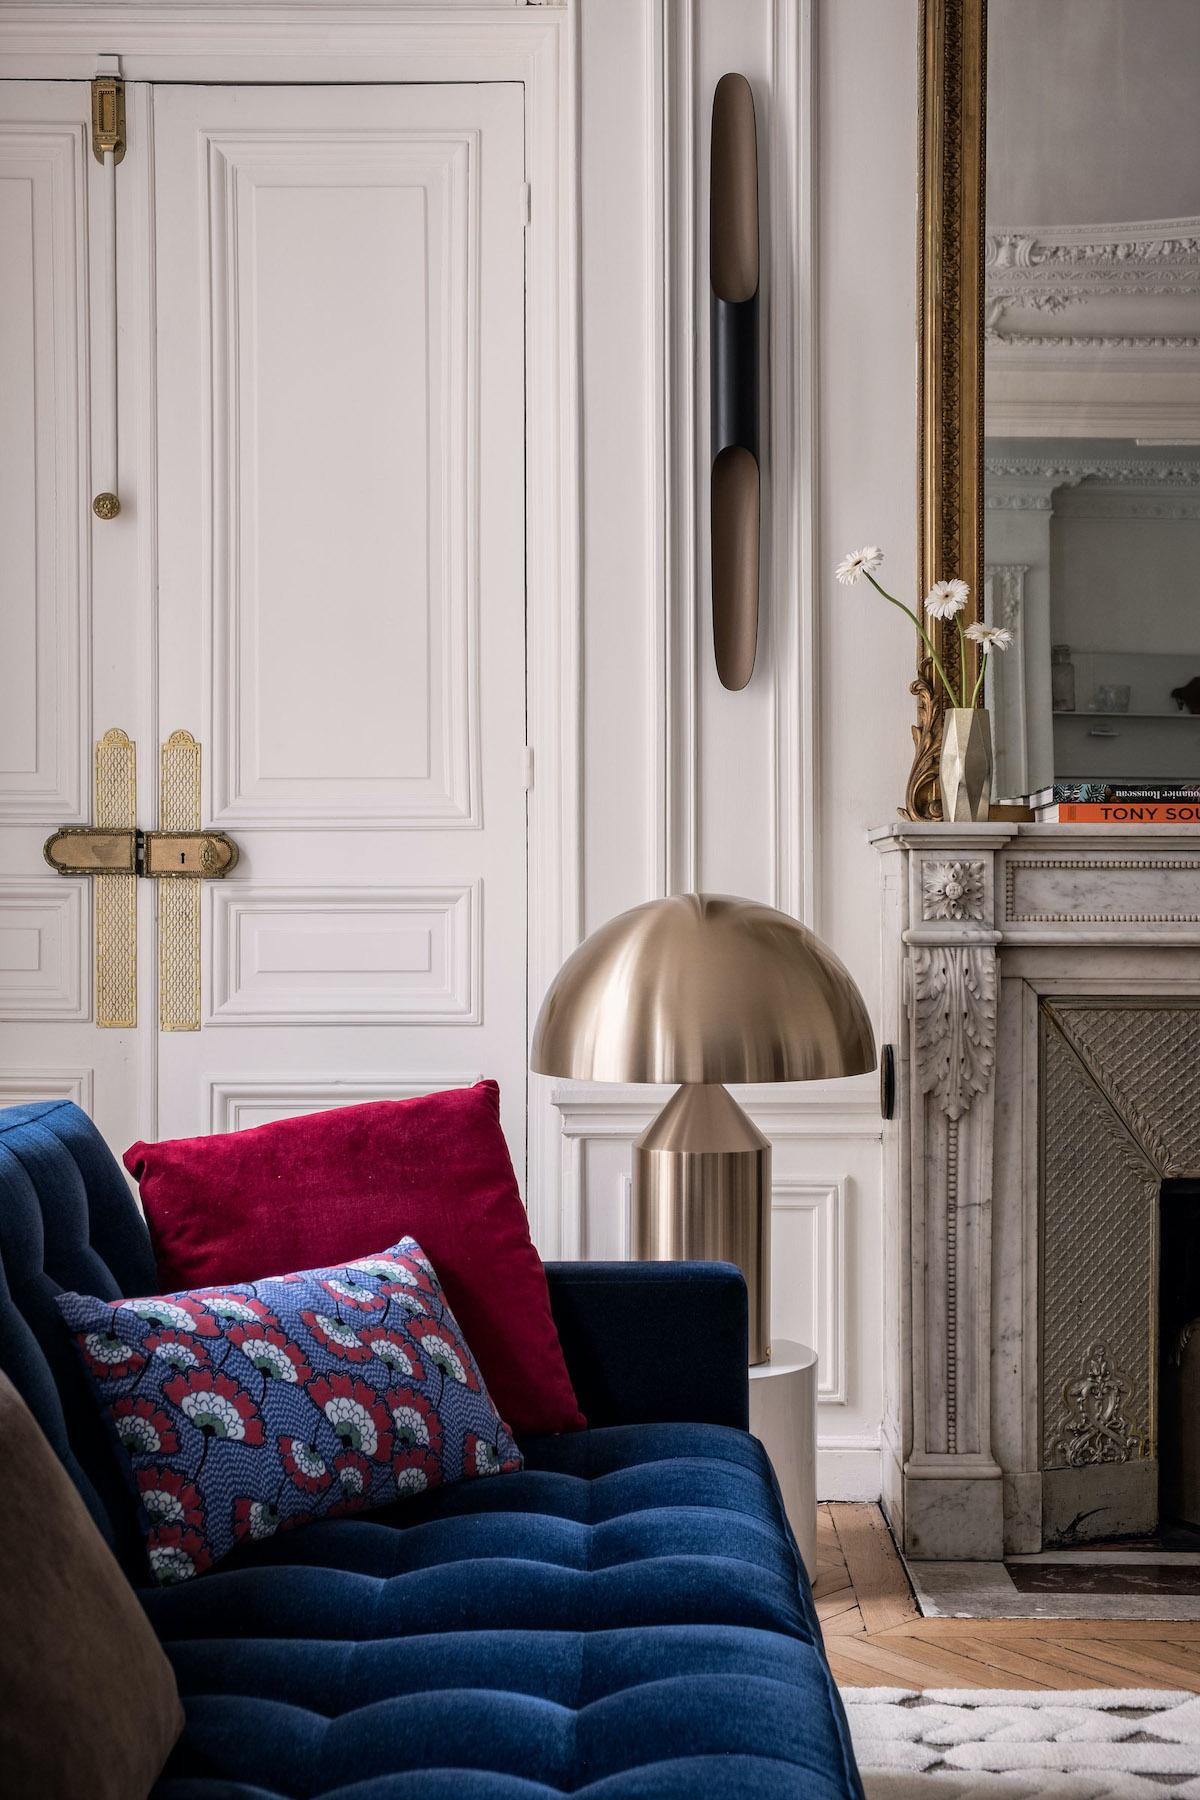 parisian style appartement canapé velours bleu lampe dorée ATOLLO Vico Magistretti O Luce